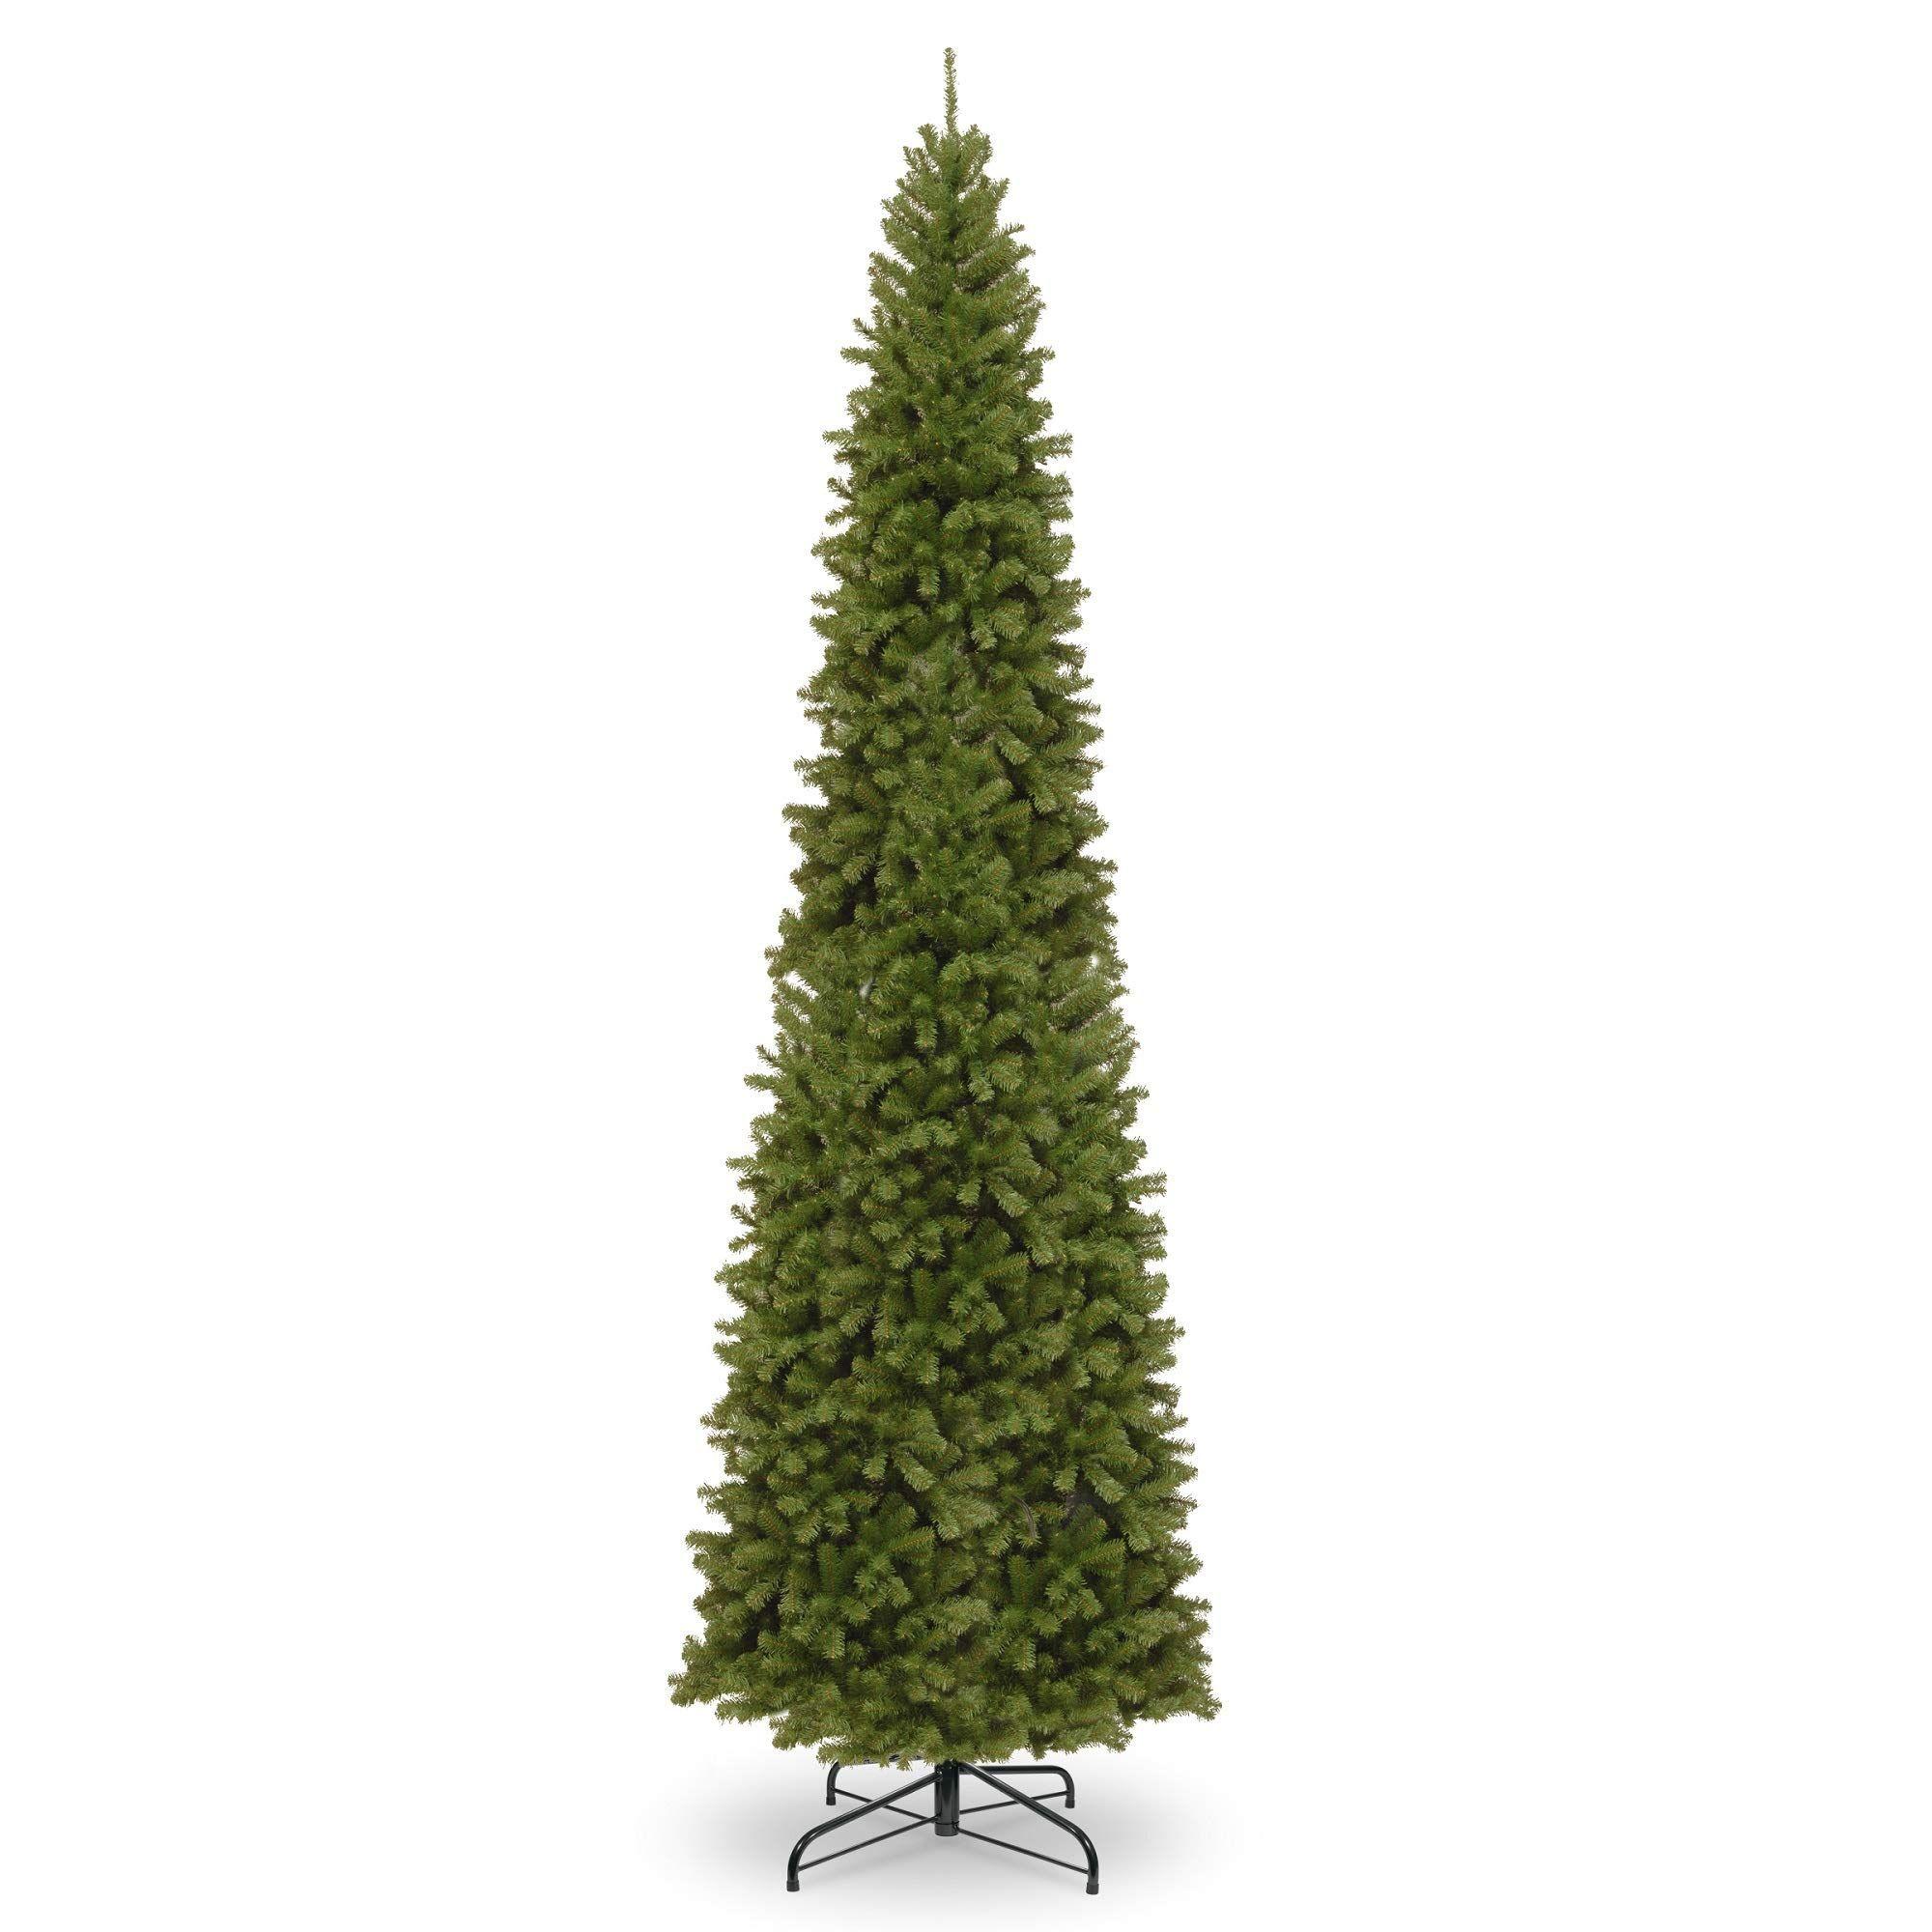 16' North Valley Spruce Pencil Slim Artificial Christmas